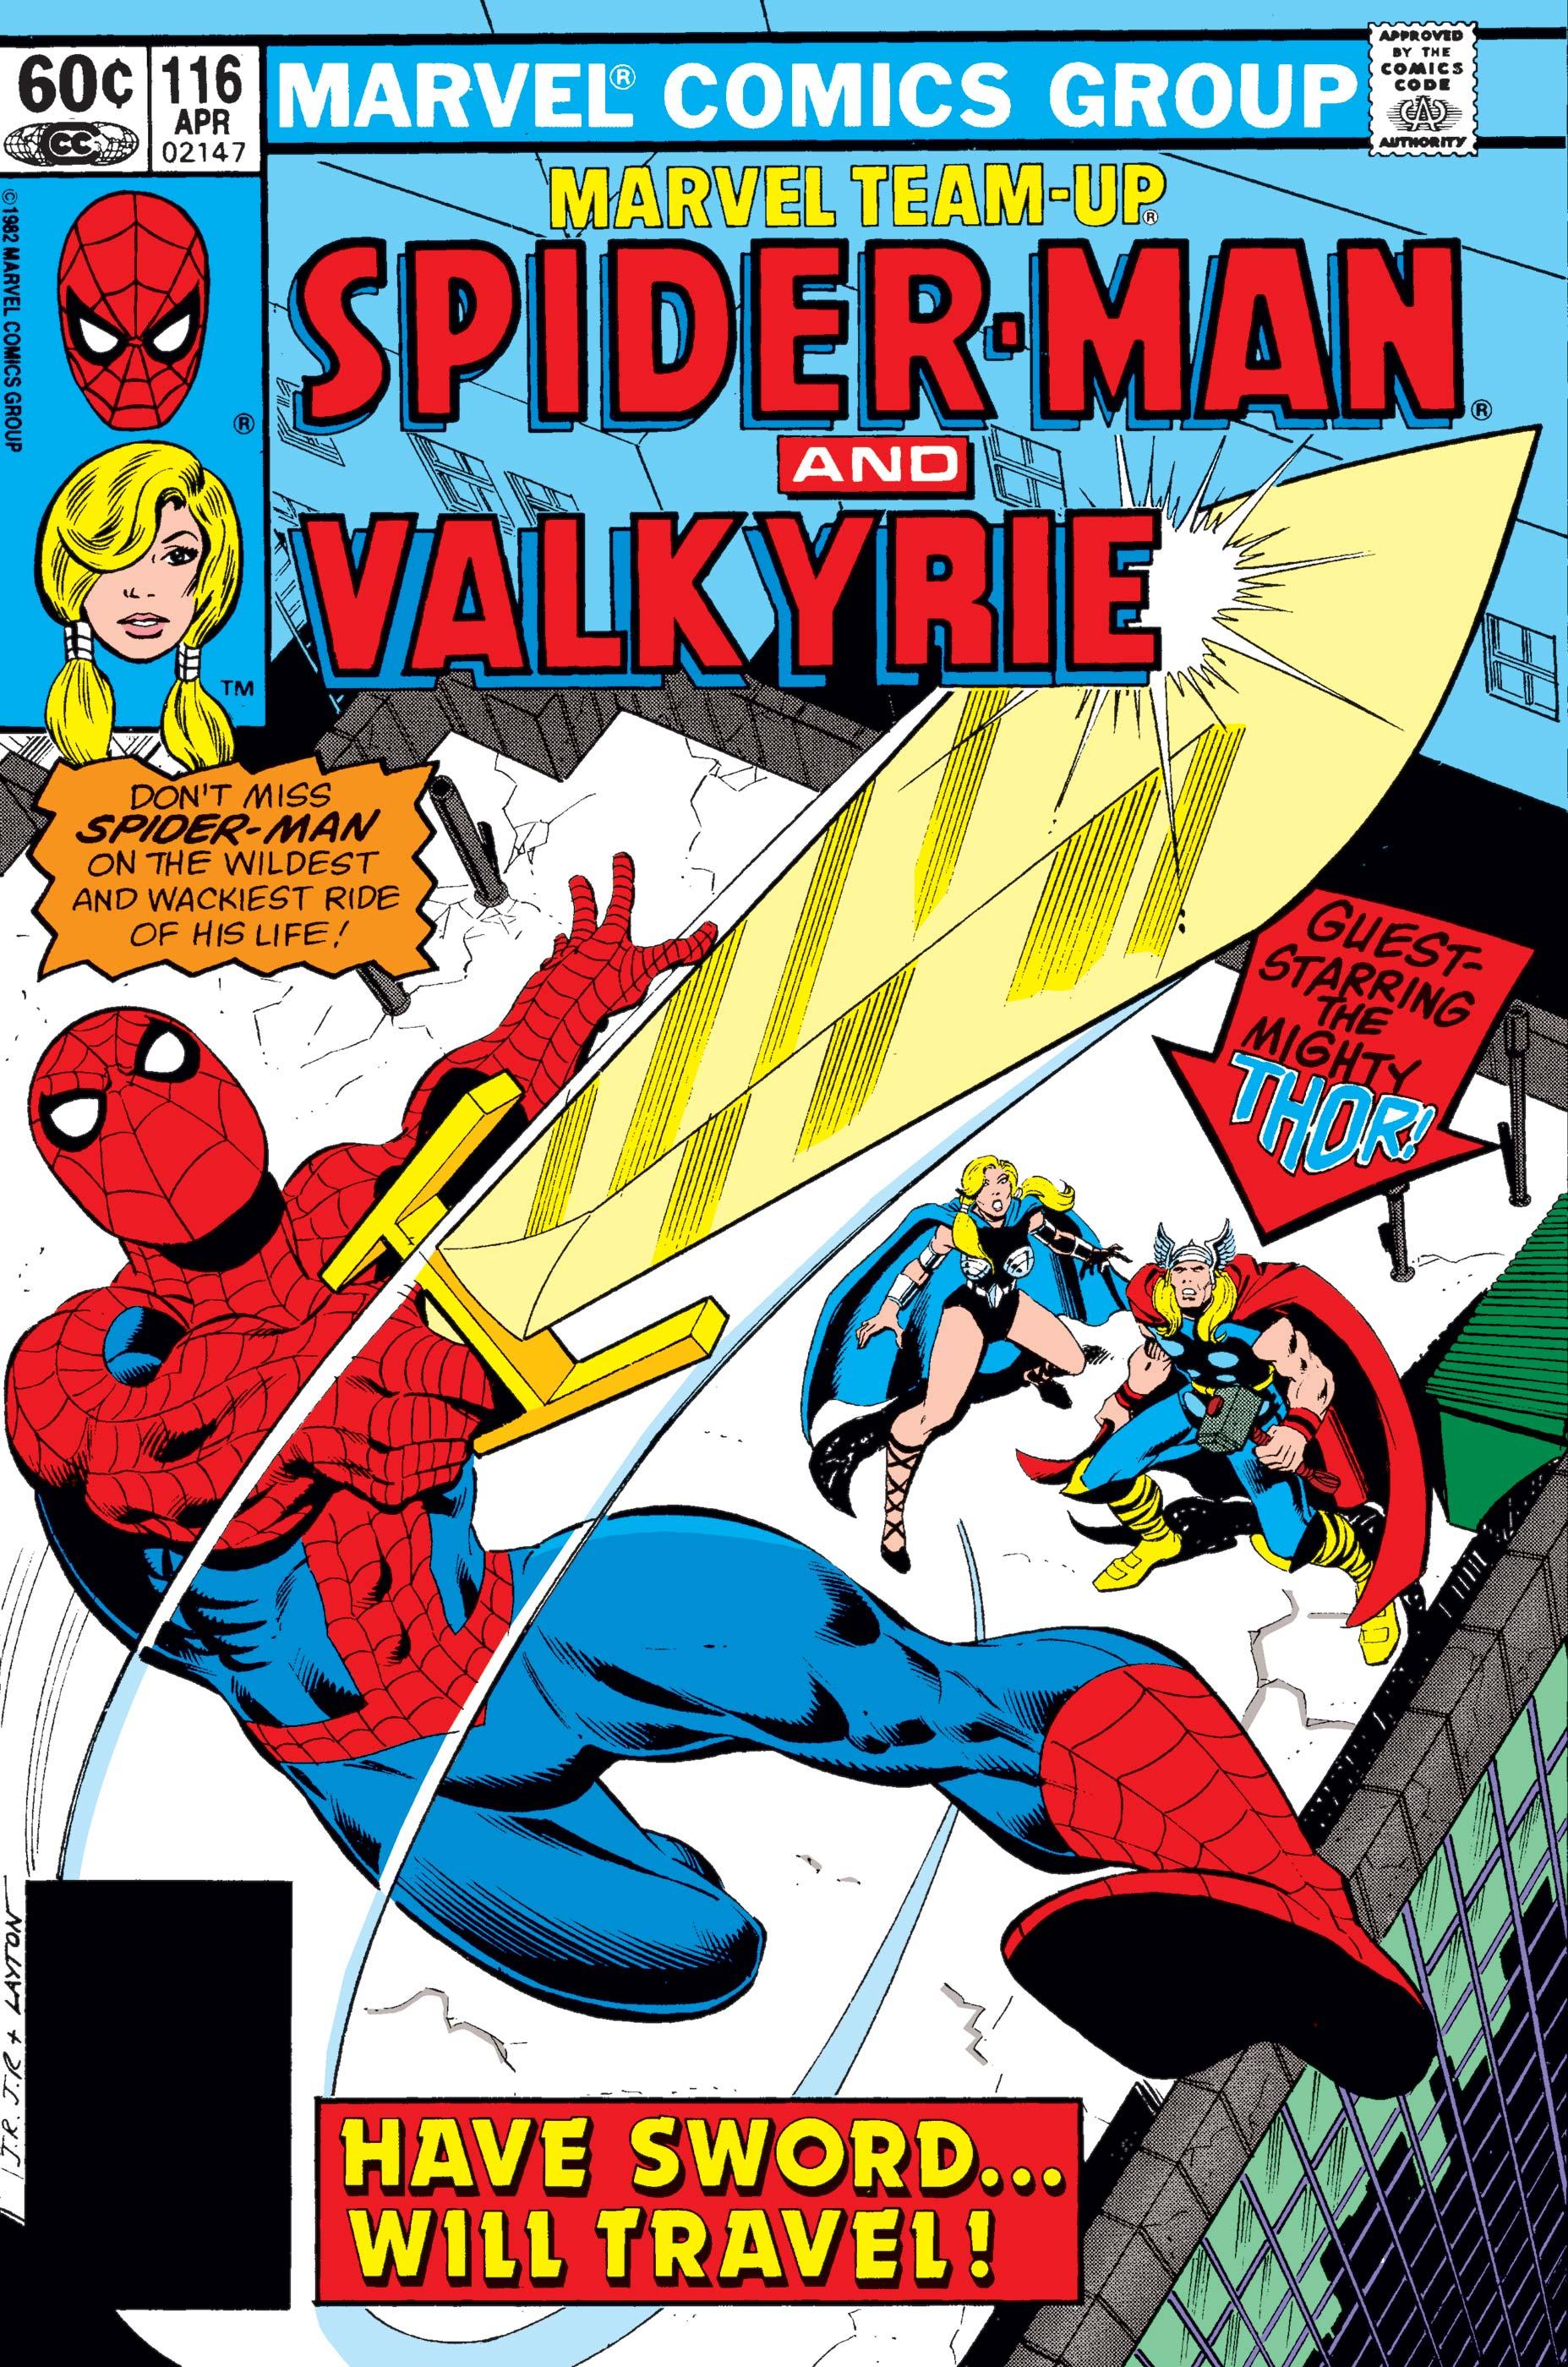 Marvel Team-Up (1972) #116